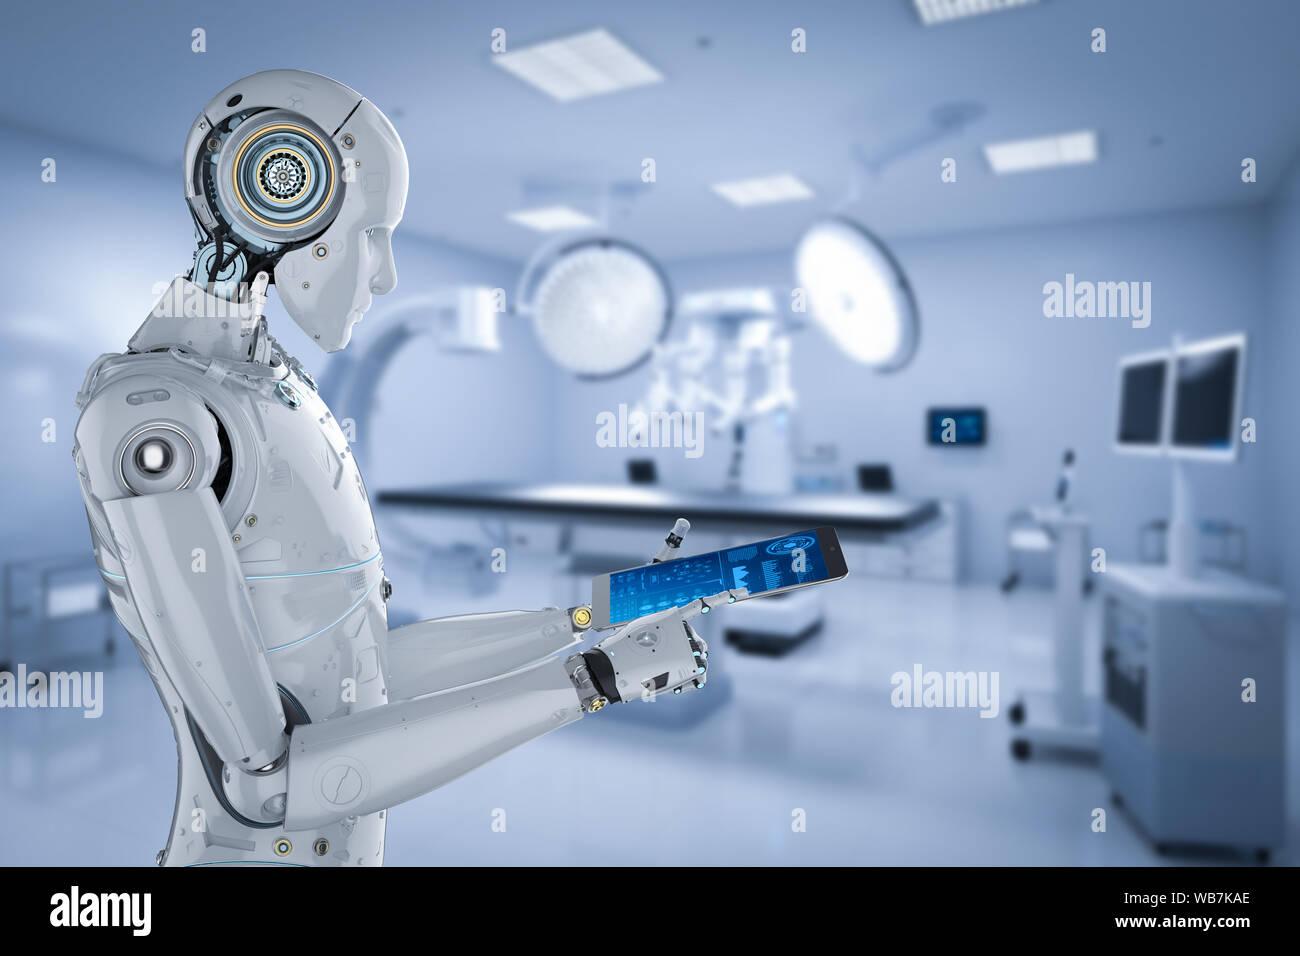 Diagnos Stock Photos & Diagnos Stock Images - Alamy